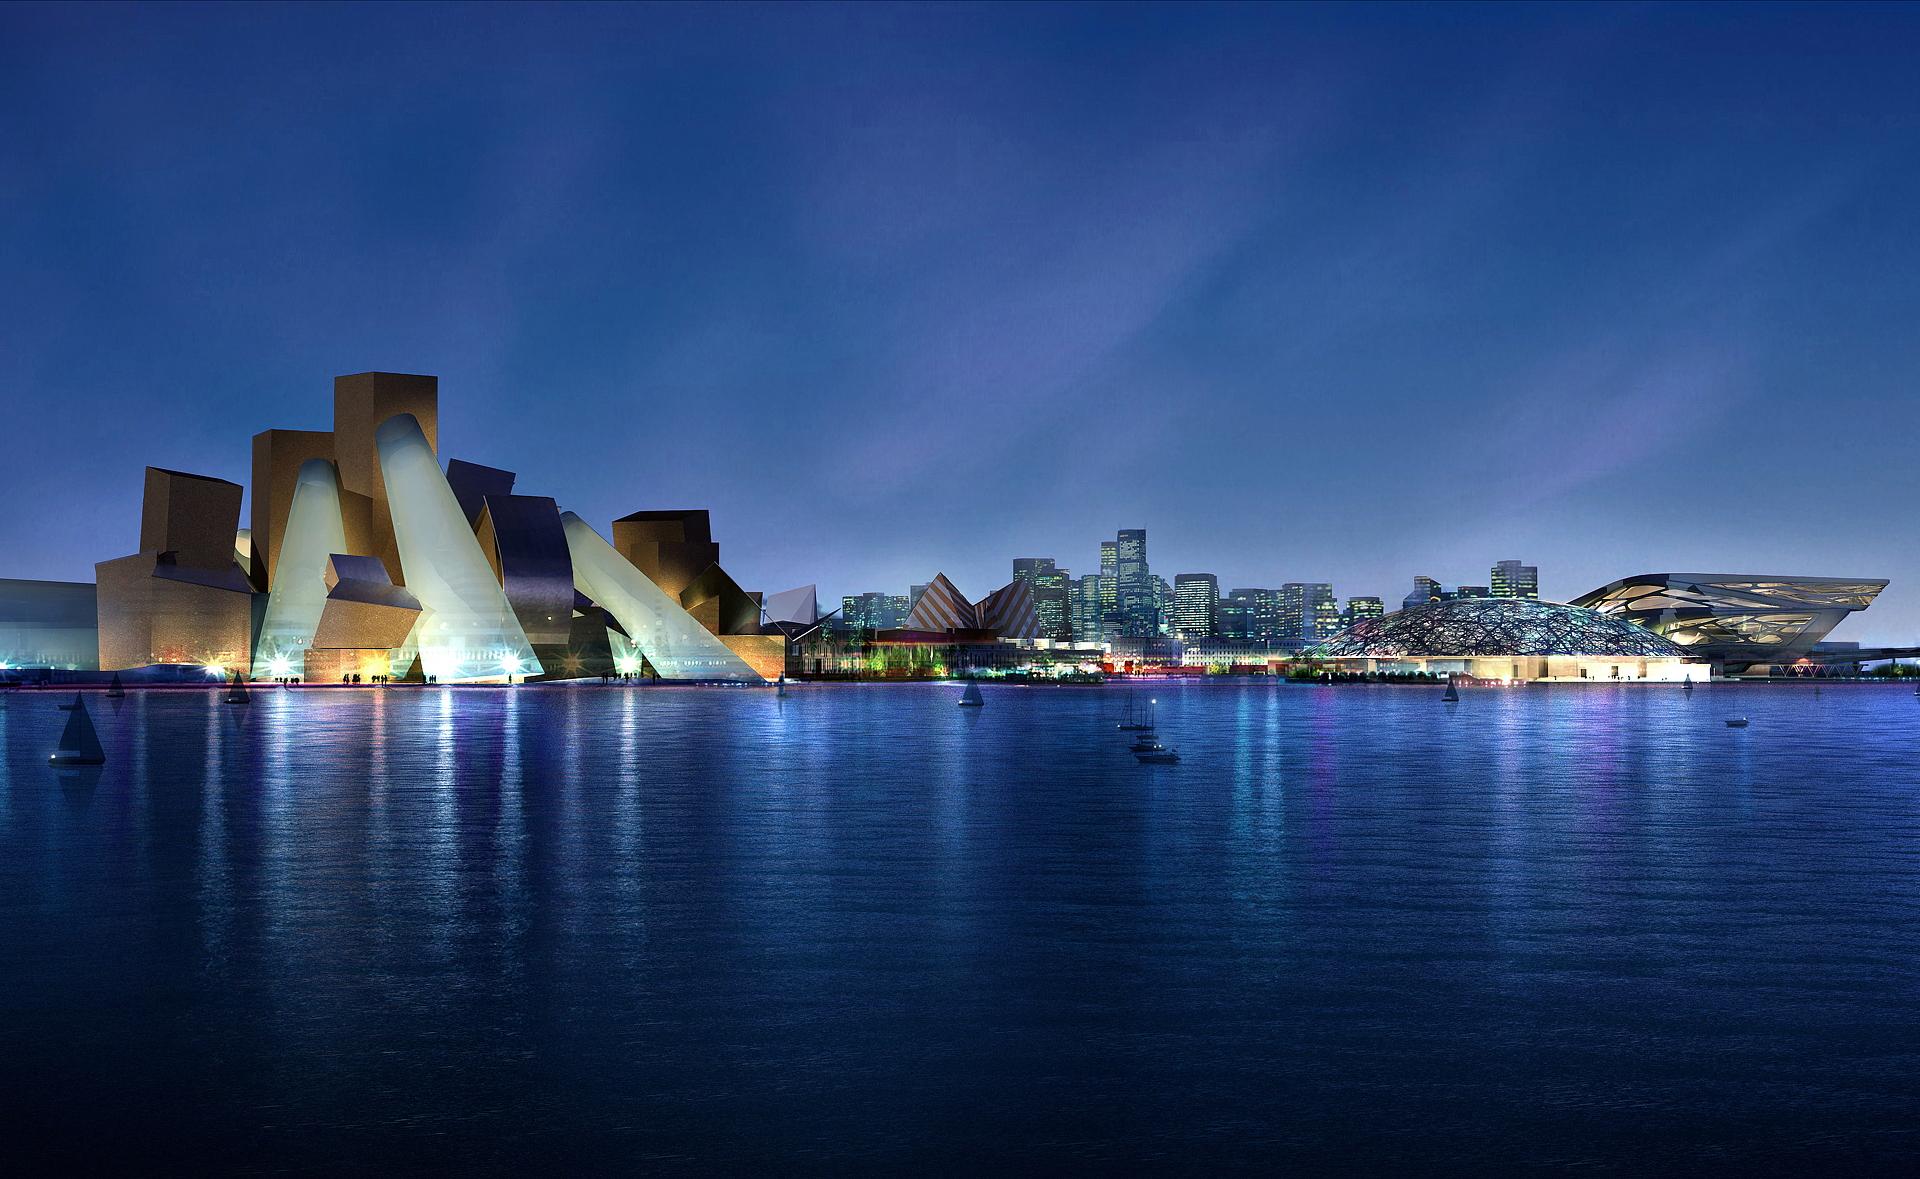 Abu Dhabi: stellar architecture and design